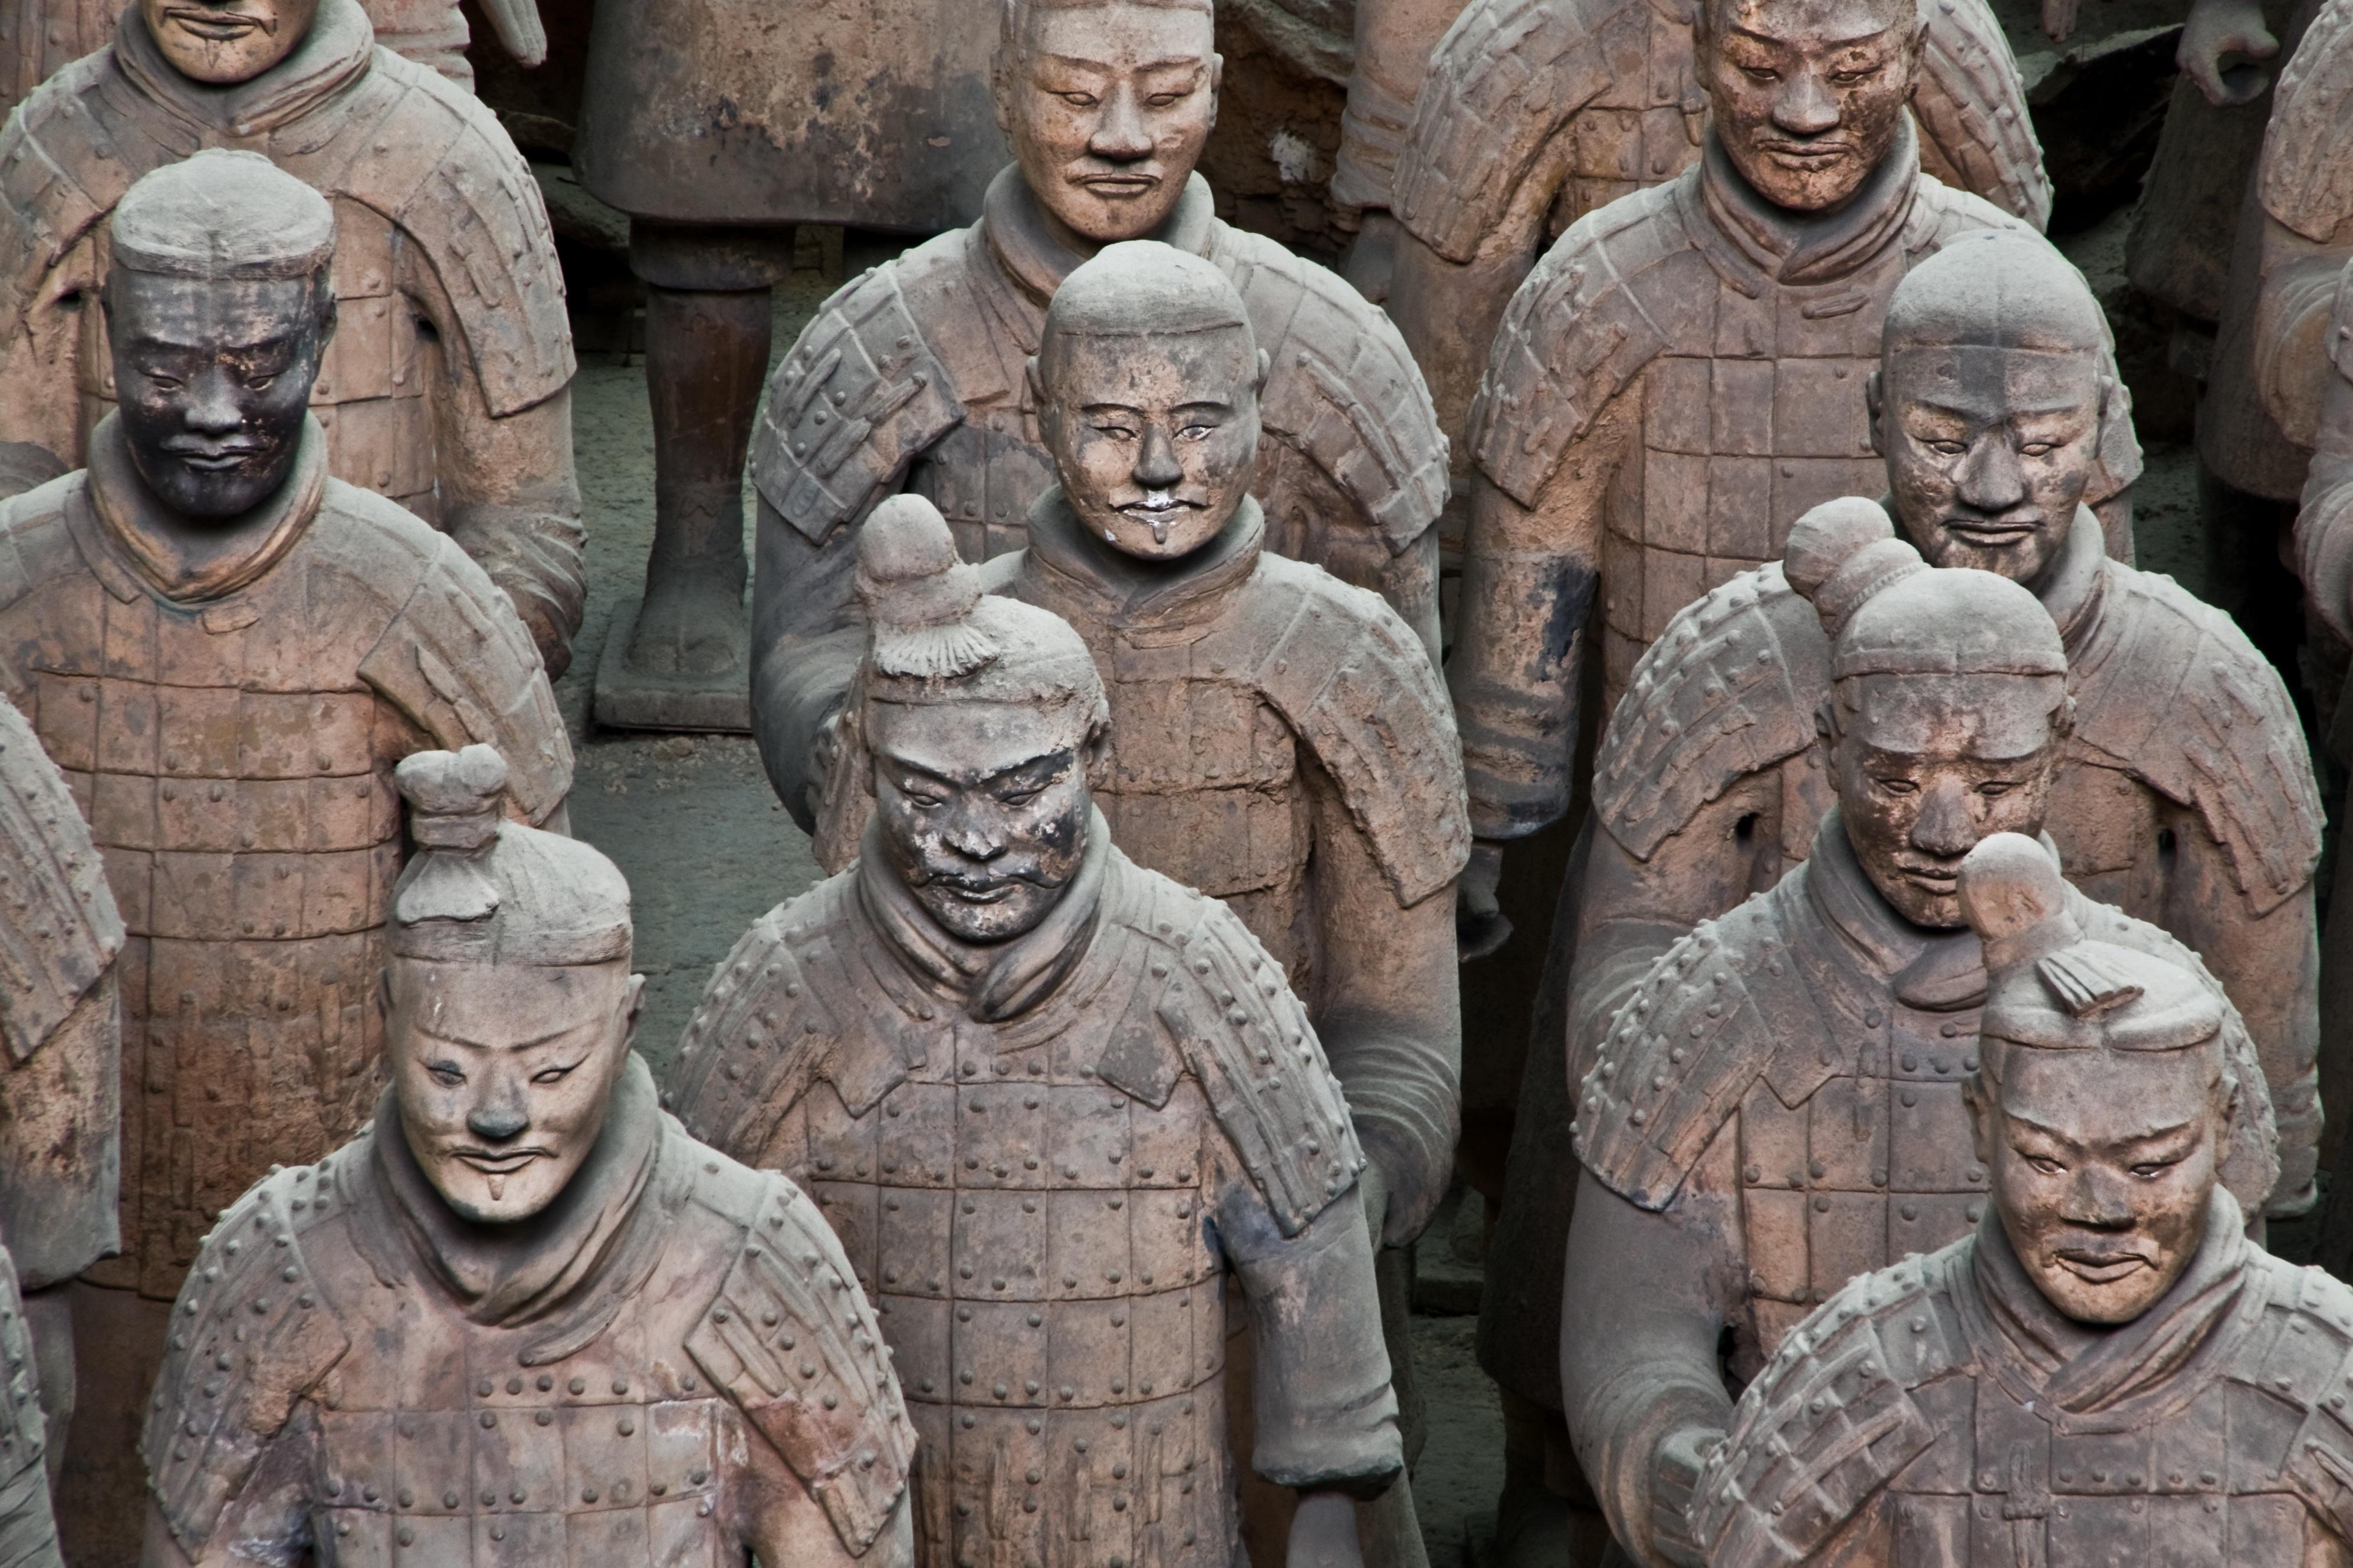 Fotos Gratis Gente Monumento Estatua Soldado